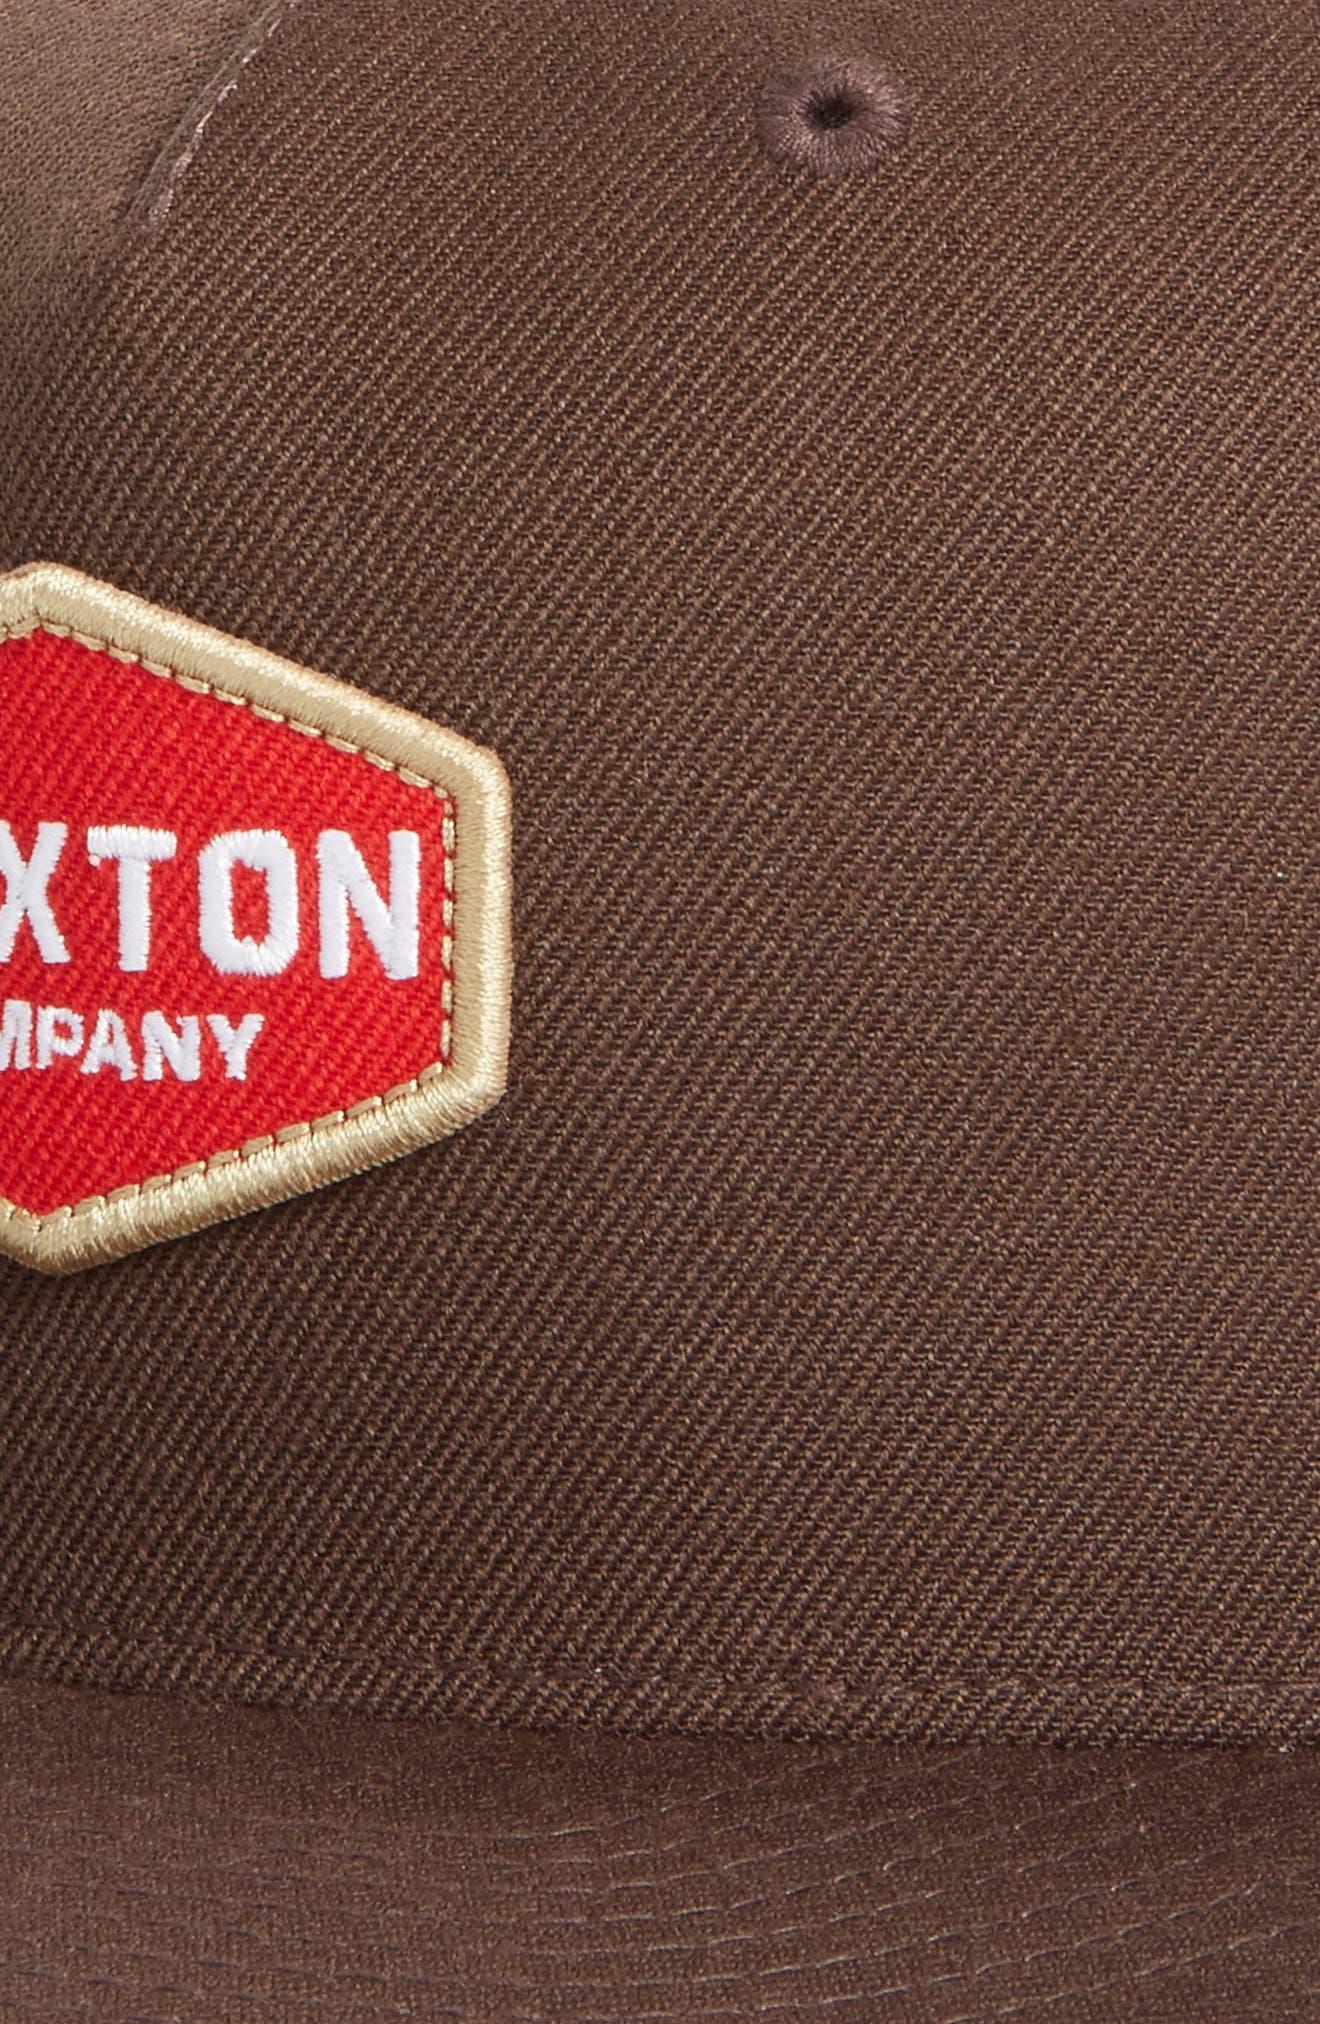 Brighton Obtuse Snapback Baseball Cap,                             Alternate thumbnail 3, color,                             200